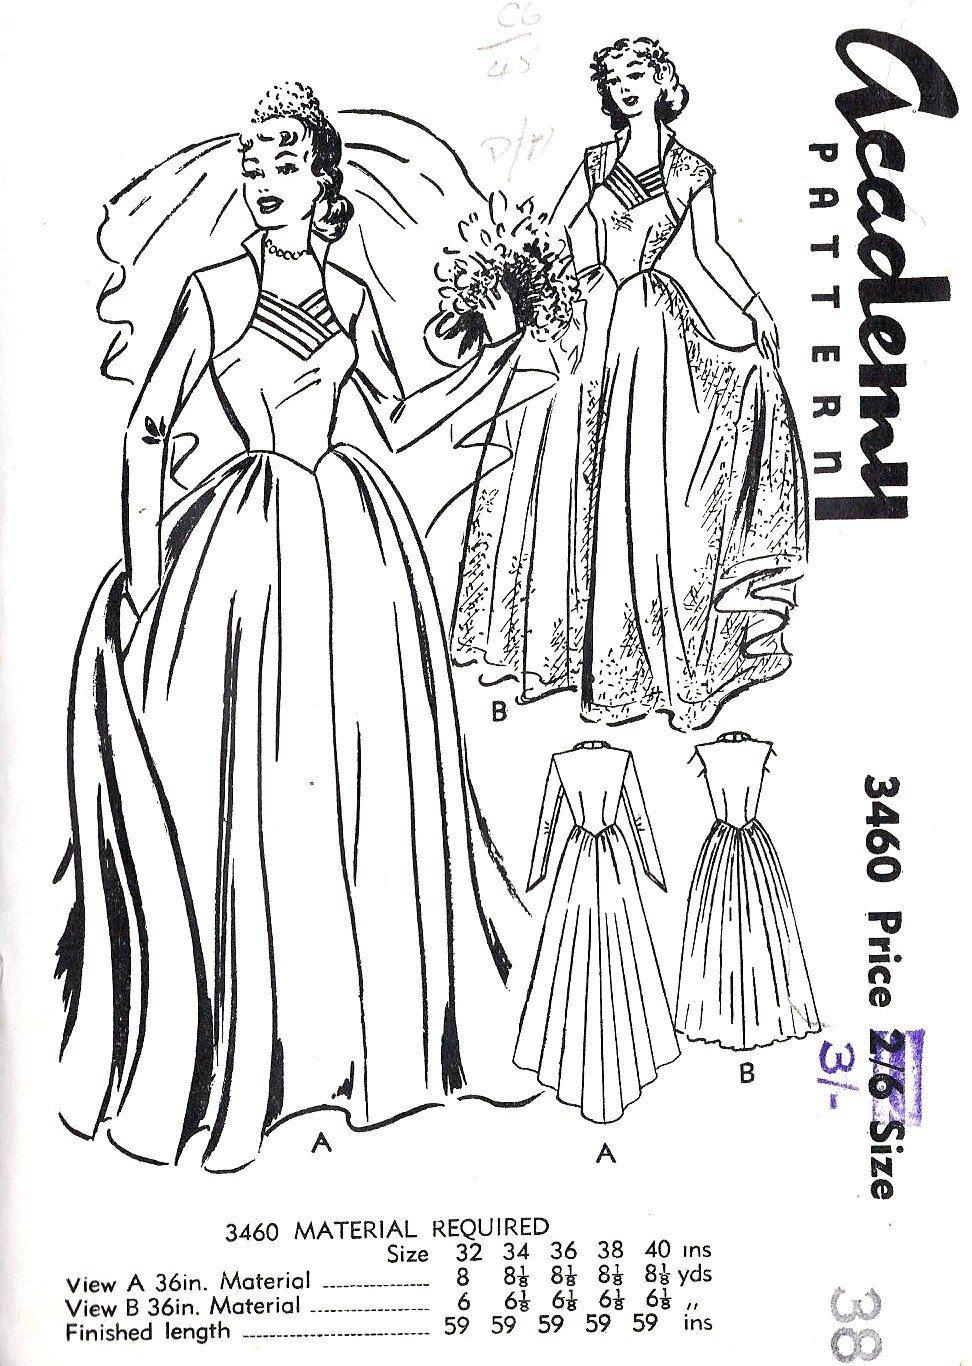 S wedding dress wedding gown bridesmaid dress ball gown